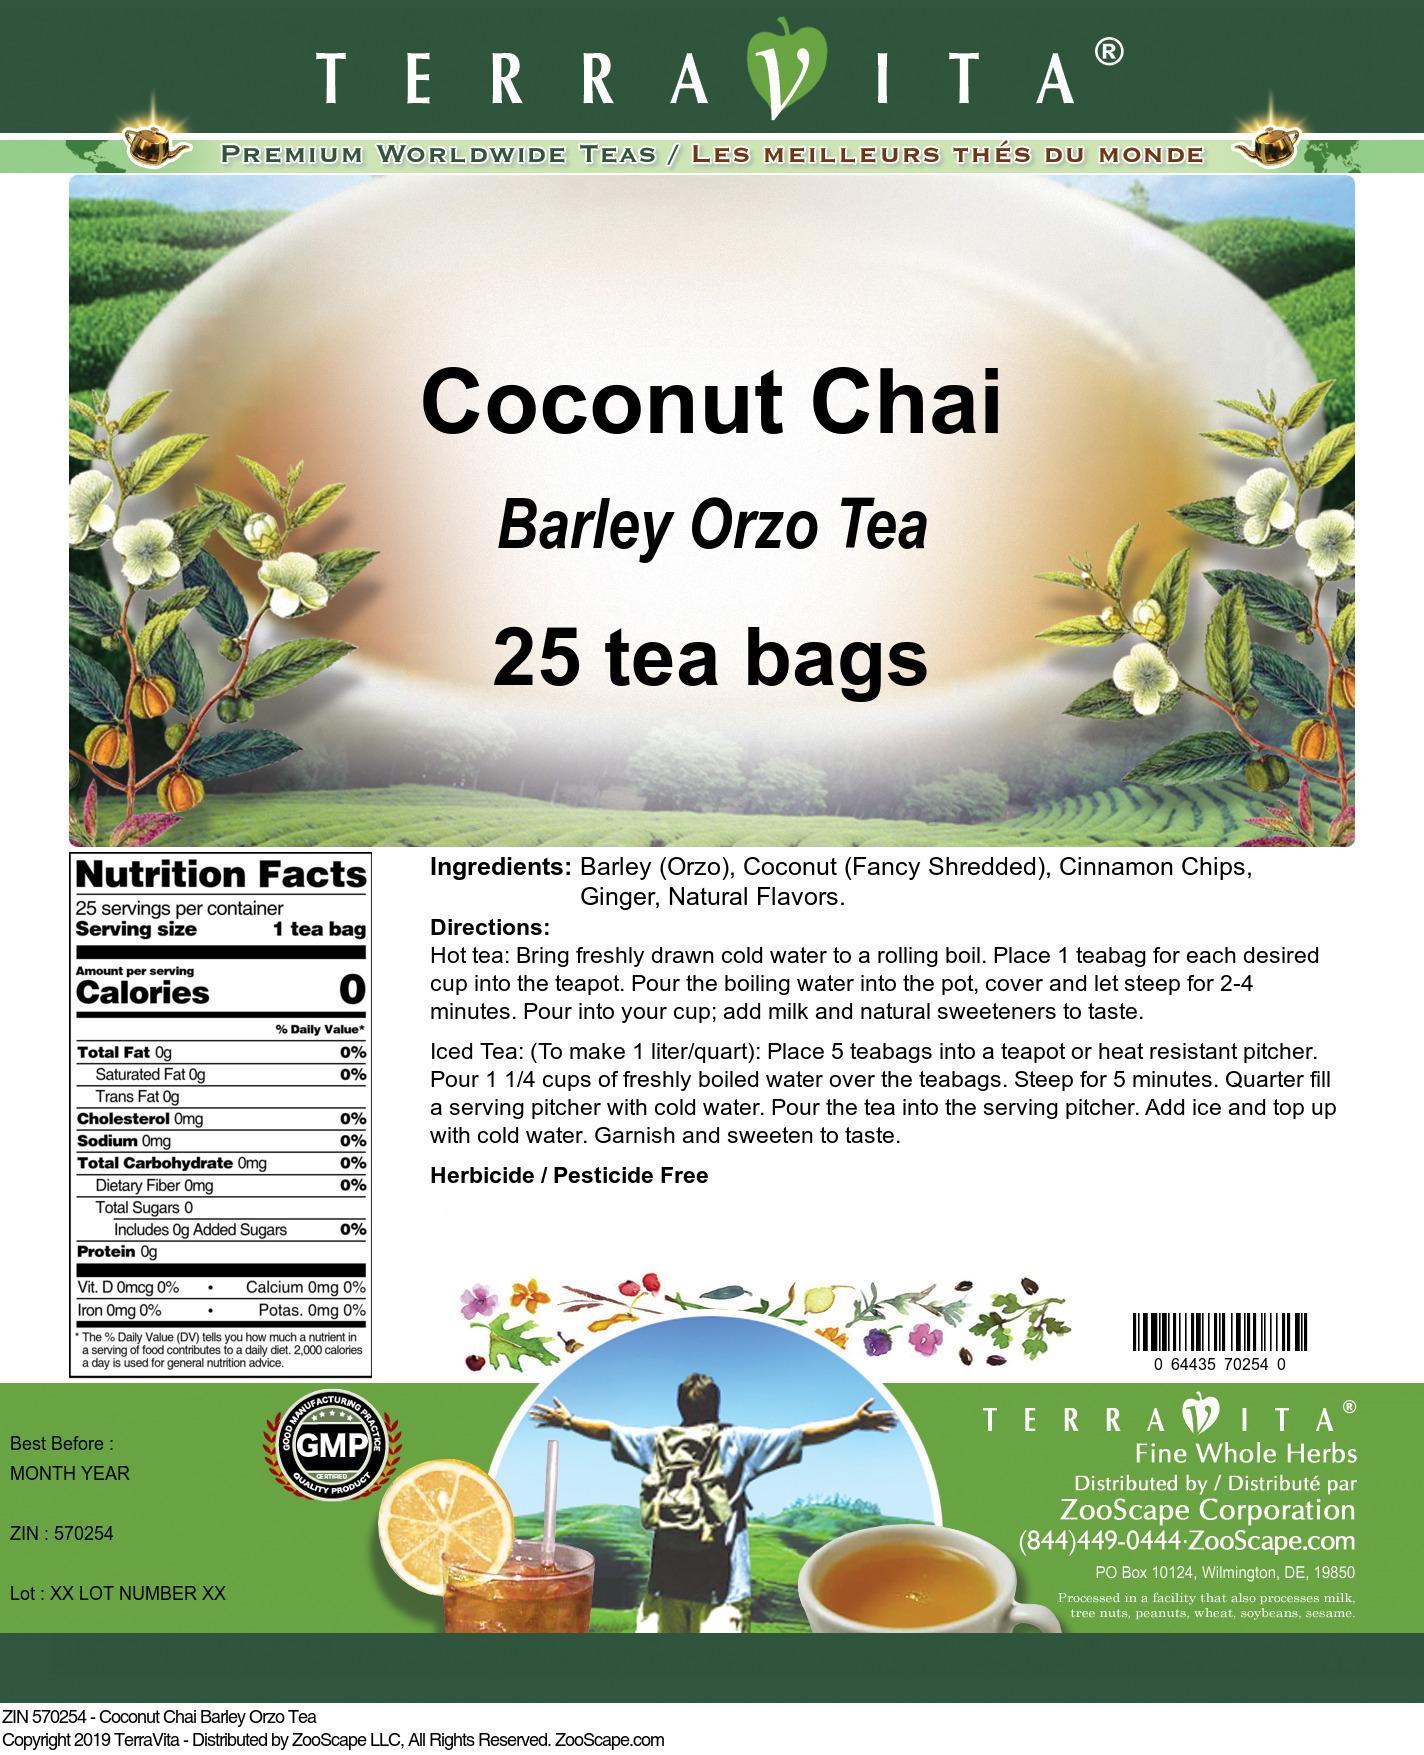 Coconut Chai Barley Orzo Tea